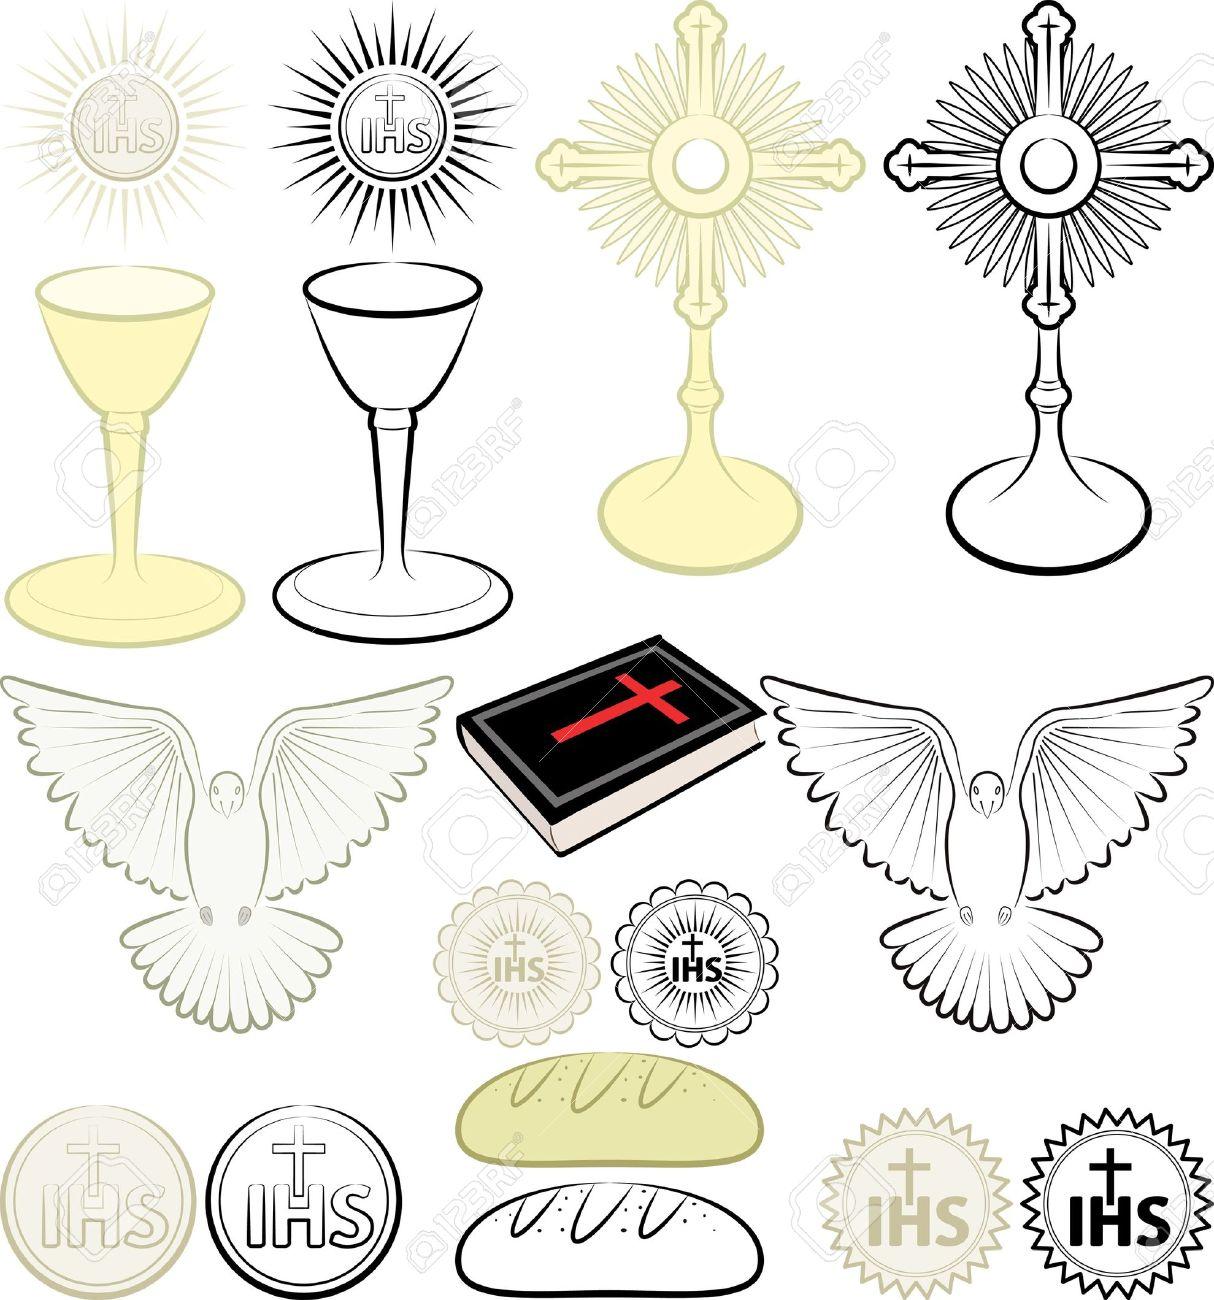 Symbols of the christian religion royalty free cliparts vectors symbols of the christian religion stock vector 15434982 biocorpaavc